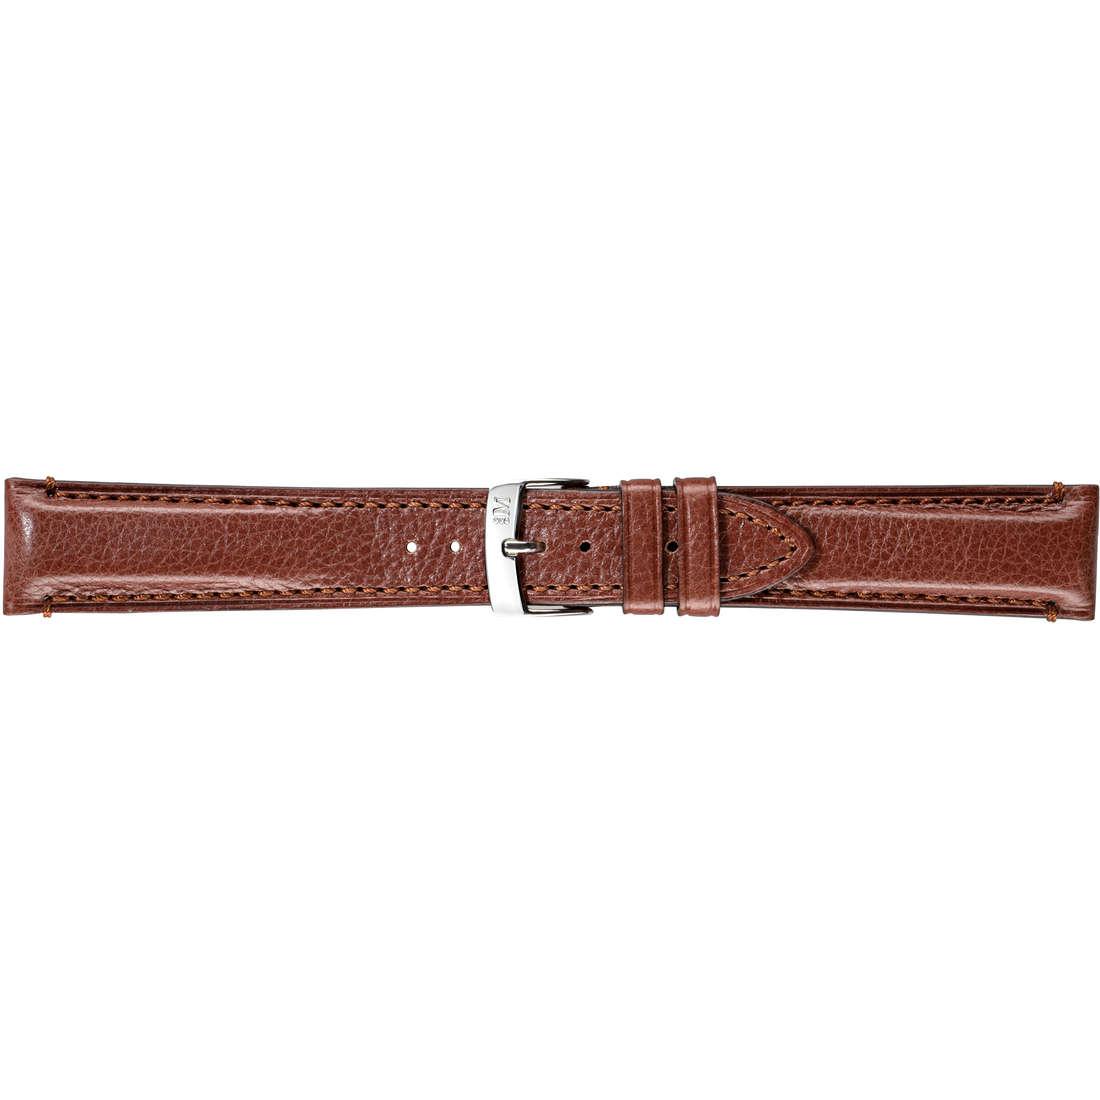 watch watch bands watch straps man Morellato Manufatti A01X4684B73041CR20